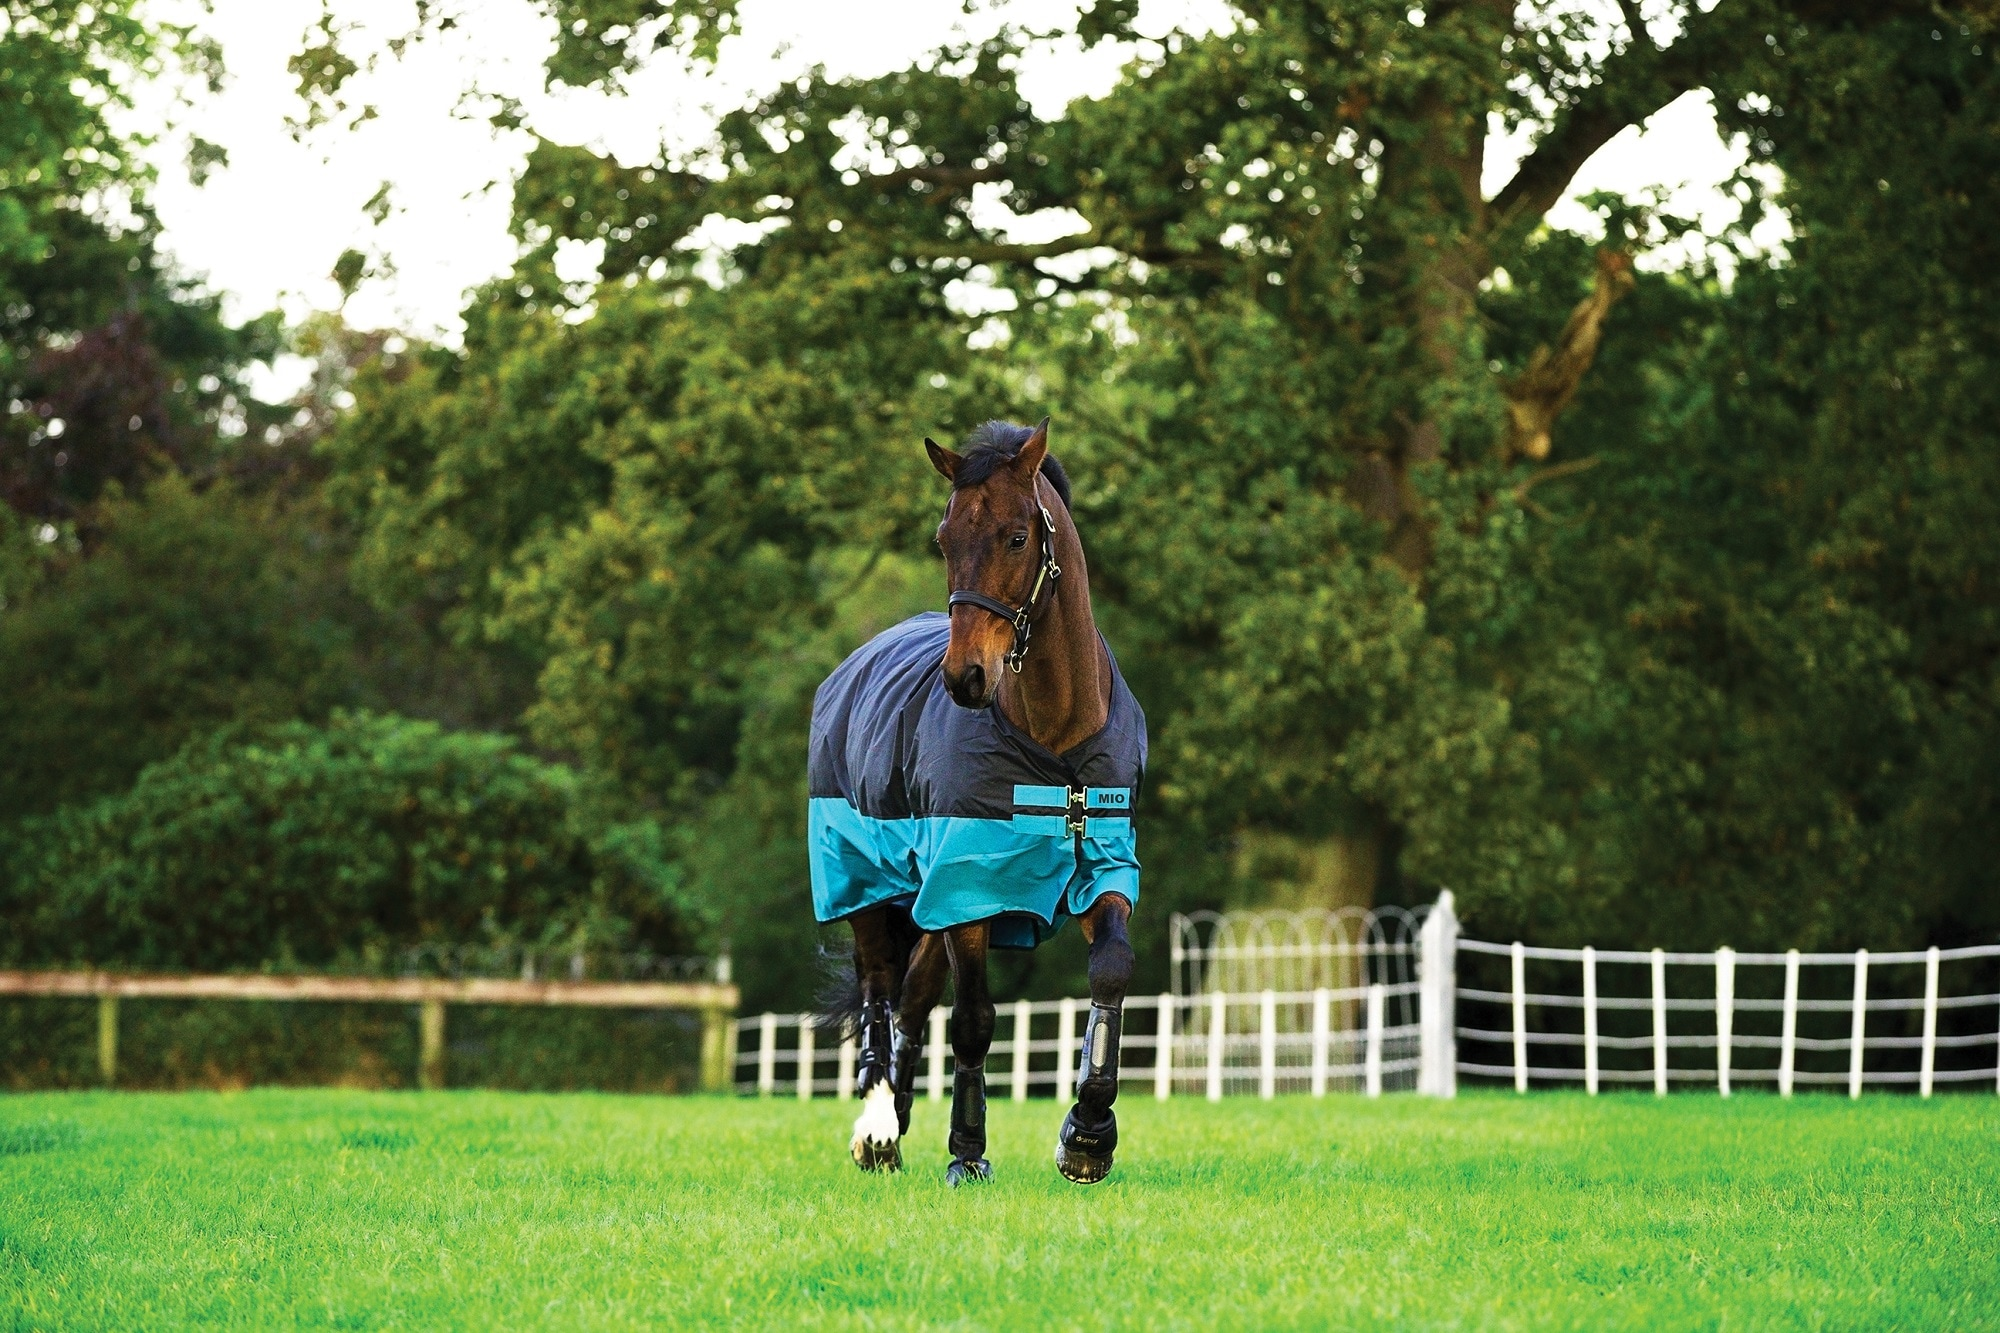 Horseware Mio kevyt ulkoloimi, 0g.